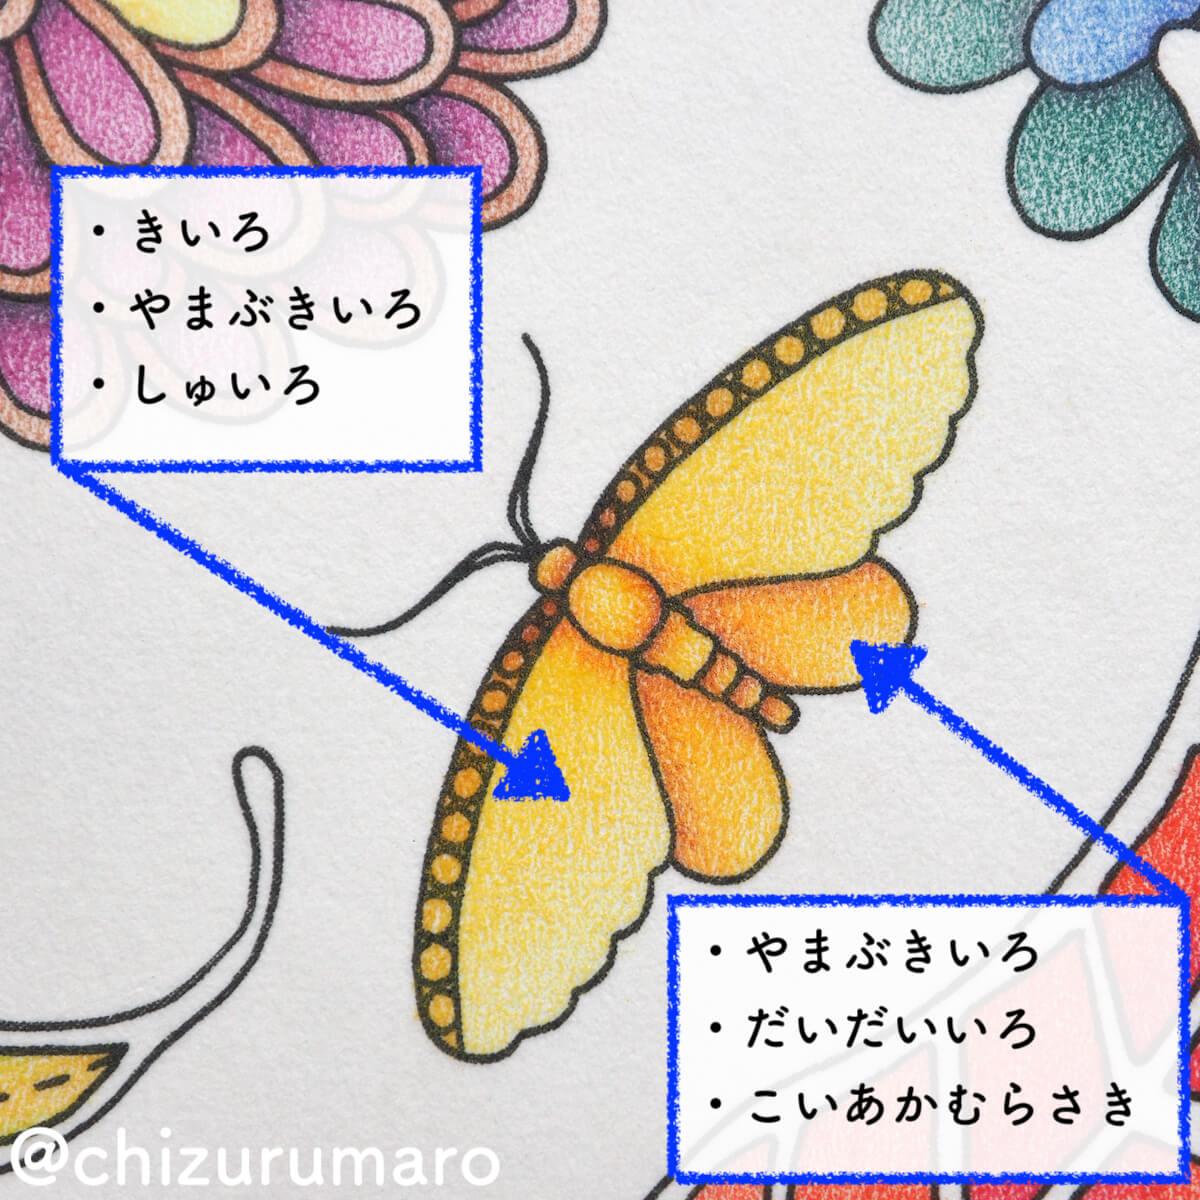 f:id:chizurumaro:20200717220524j:plain